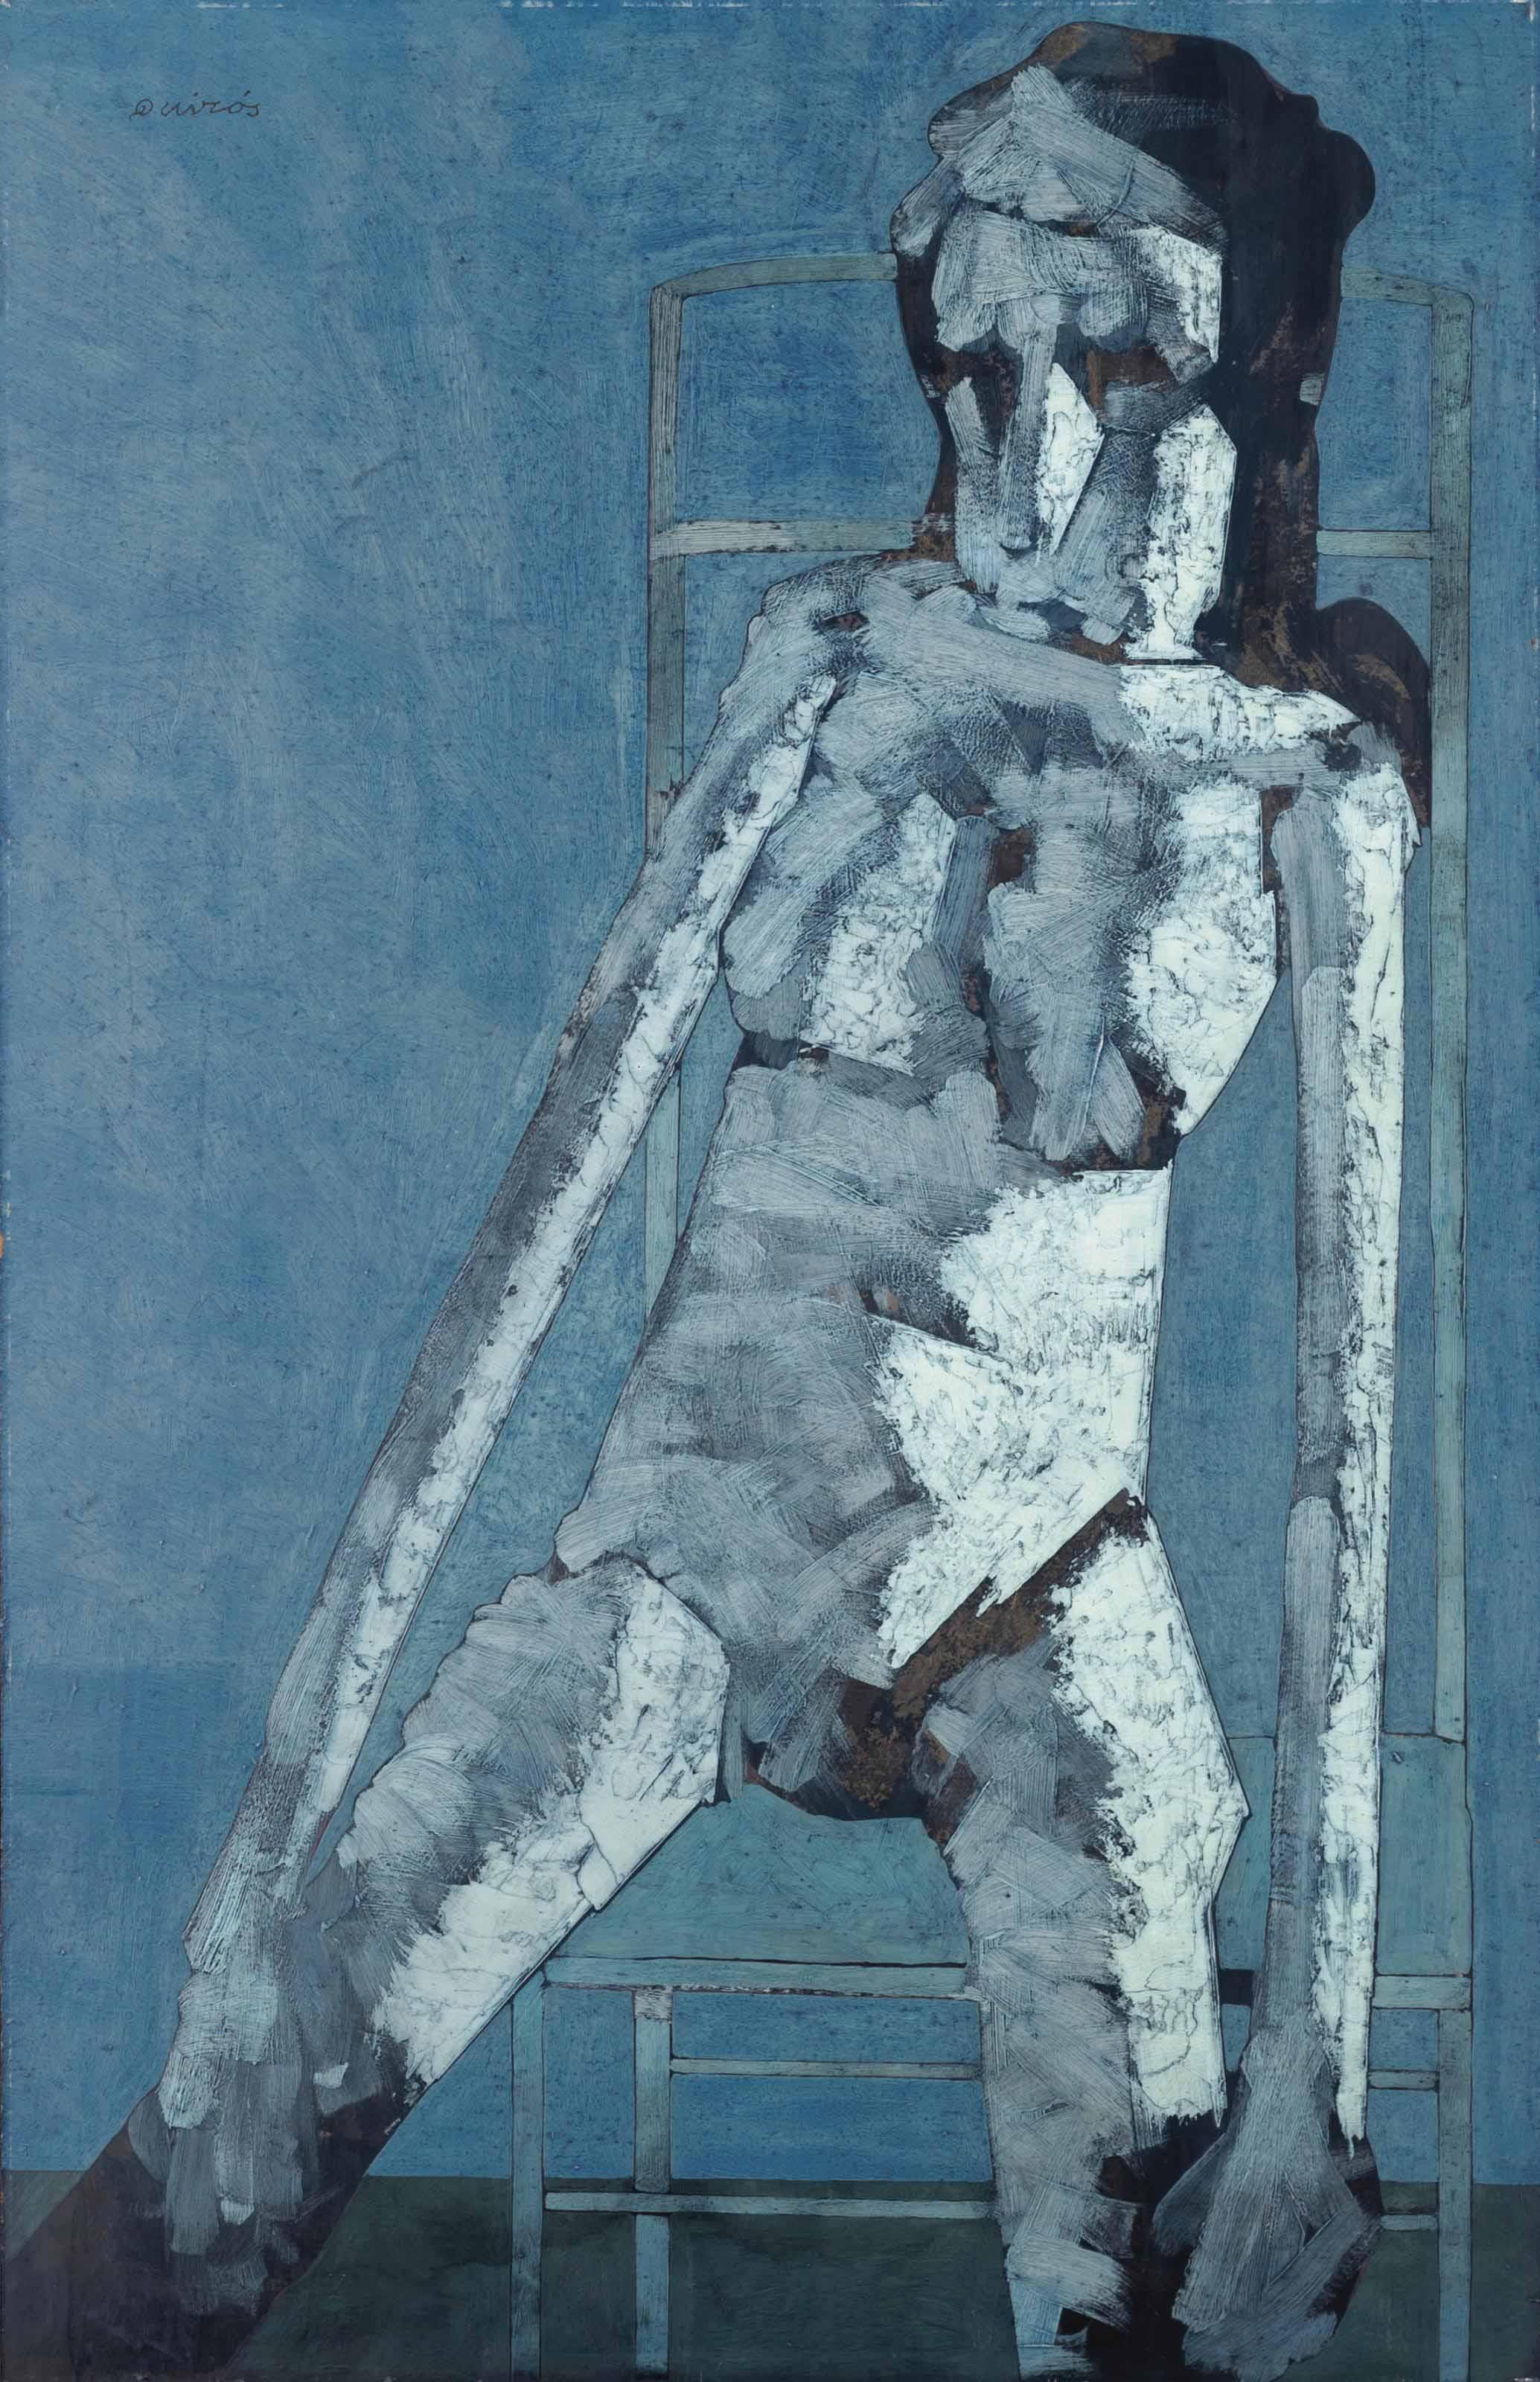 Mujer en azul sentada